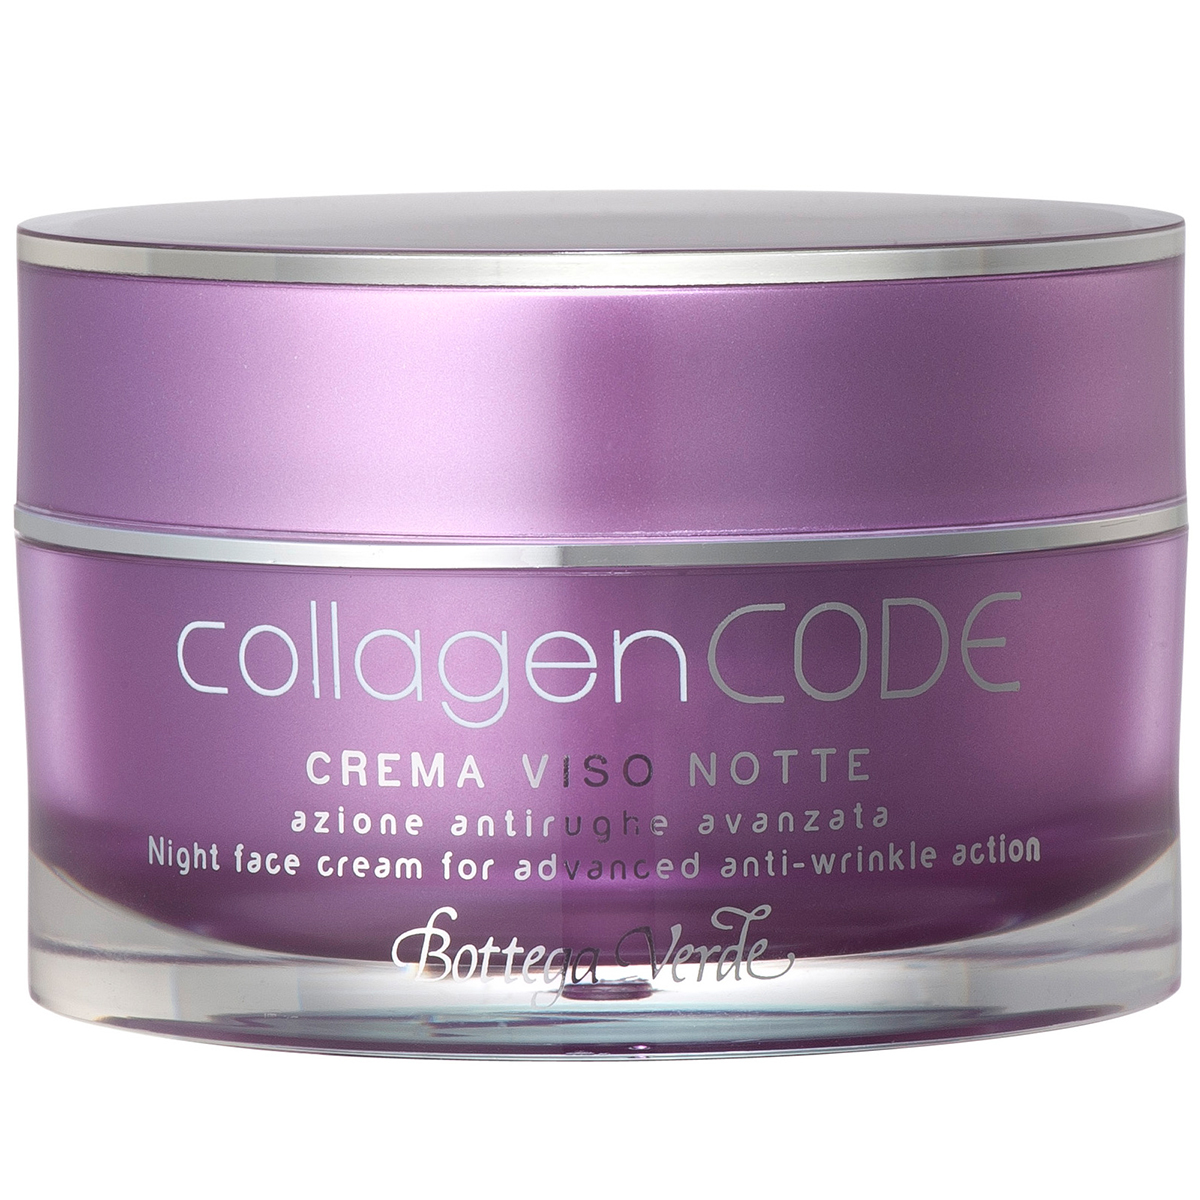 Collagencode - Crema De Fata De Noapte  Actiune Antirid Avansata  Cu Colagen Vegetal Si Elastindefence™ Hidratanta